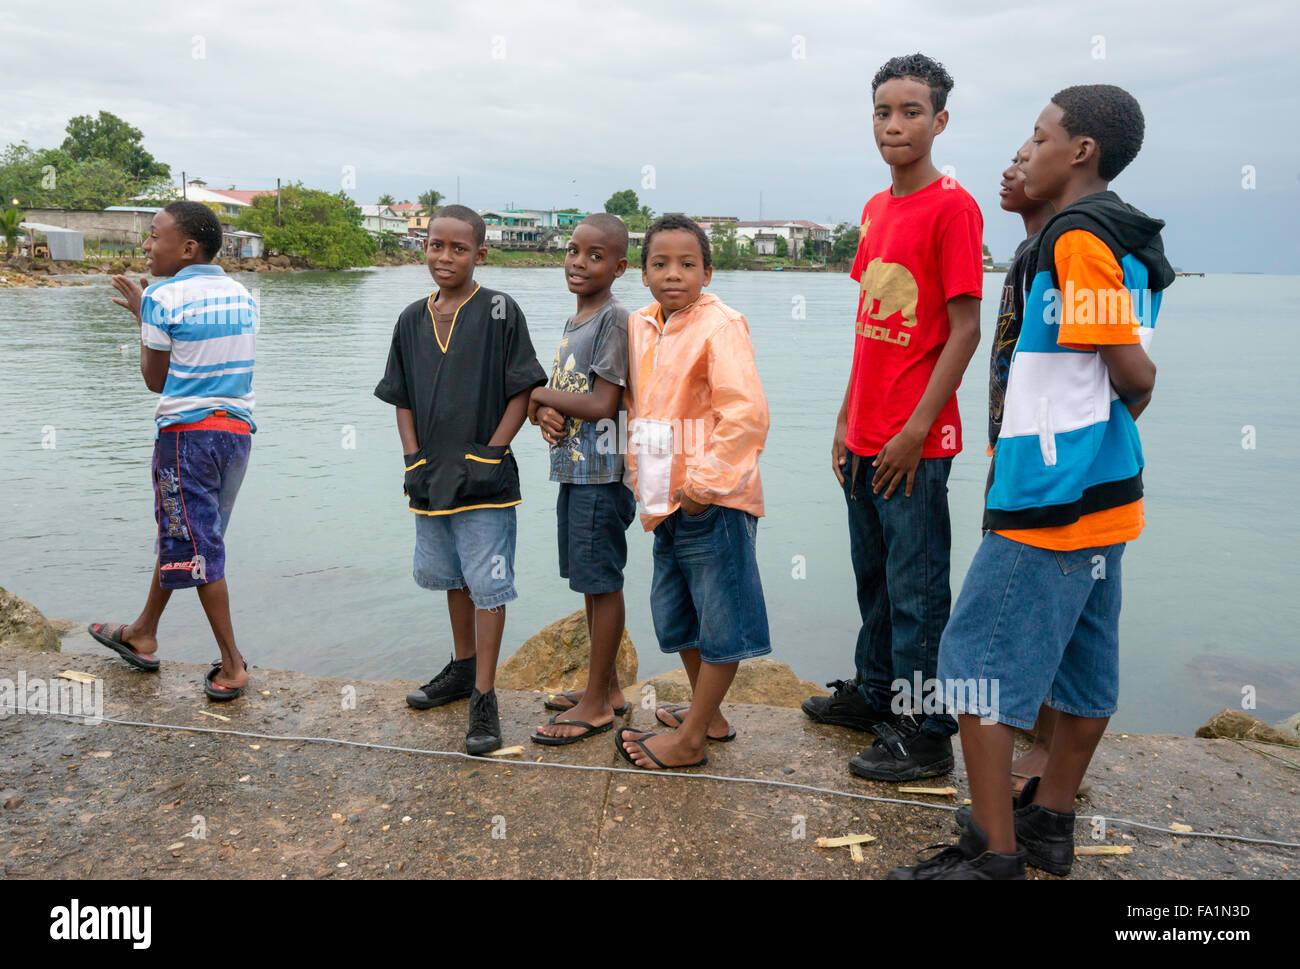 Group of boys, Garifuna Settlement Day, festival marking arrival of Garifuna people in Punta Gorda, Toledo District, - Stock Image